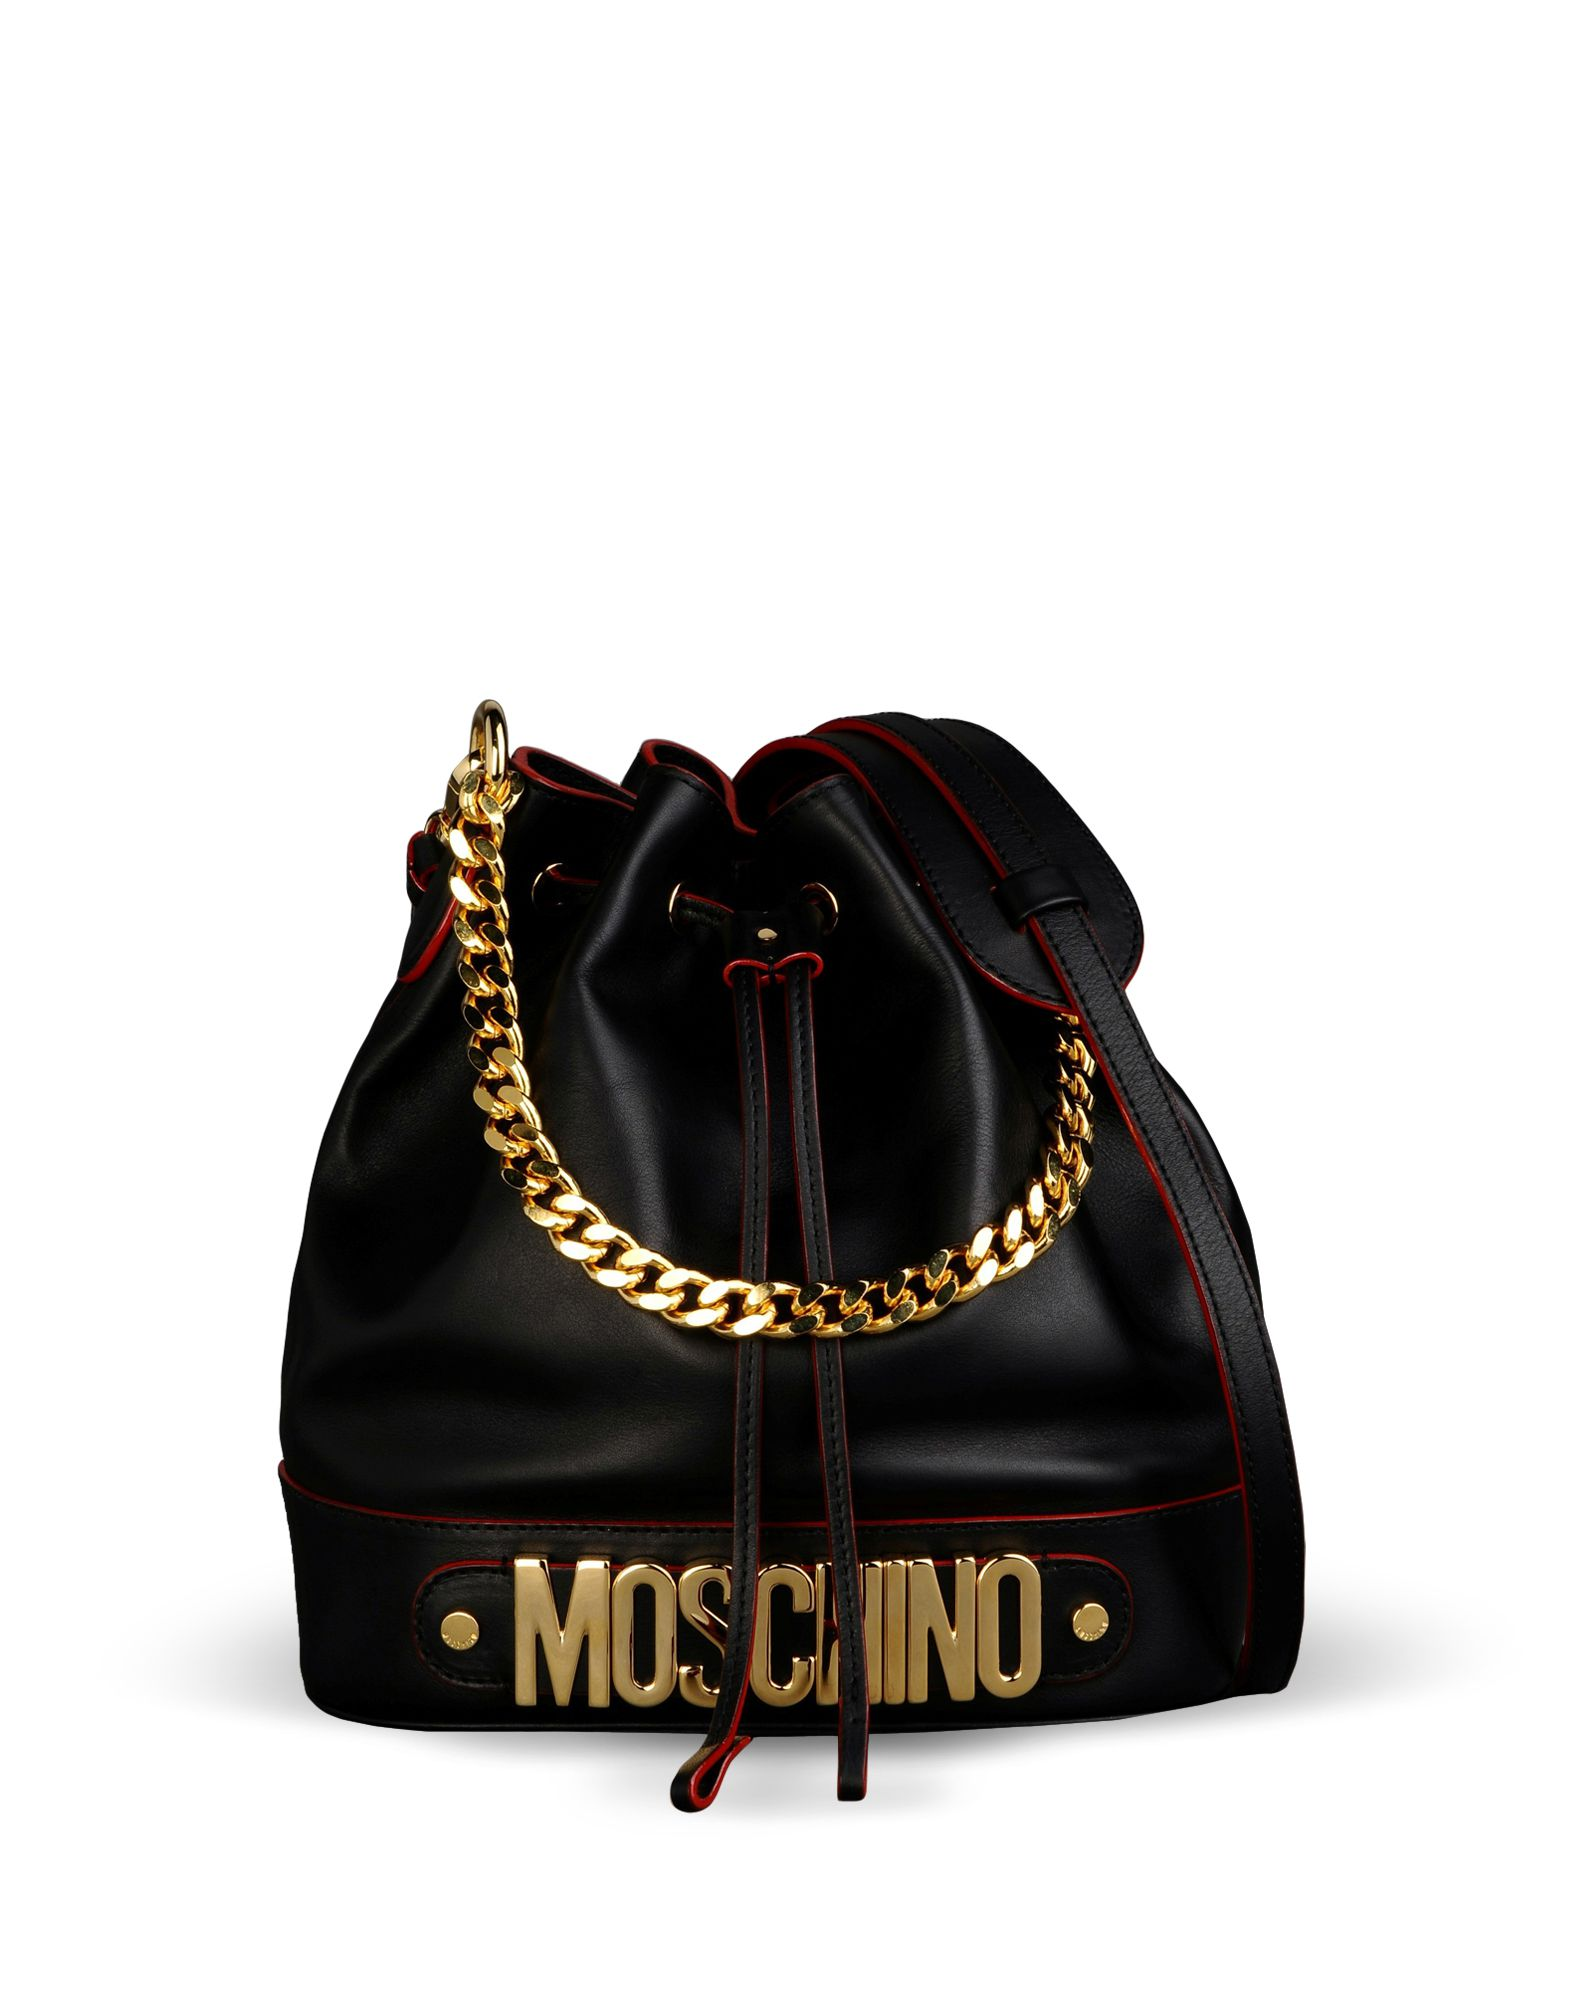 Medium Leather Bag Women - Moschino Online Store